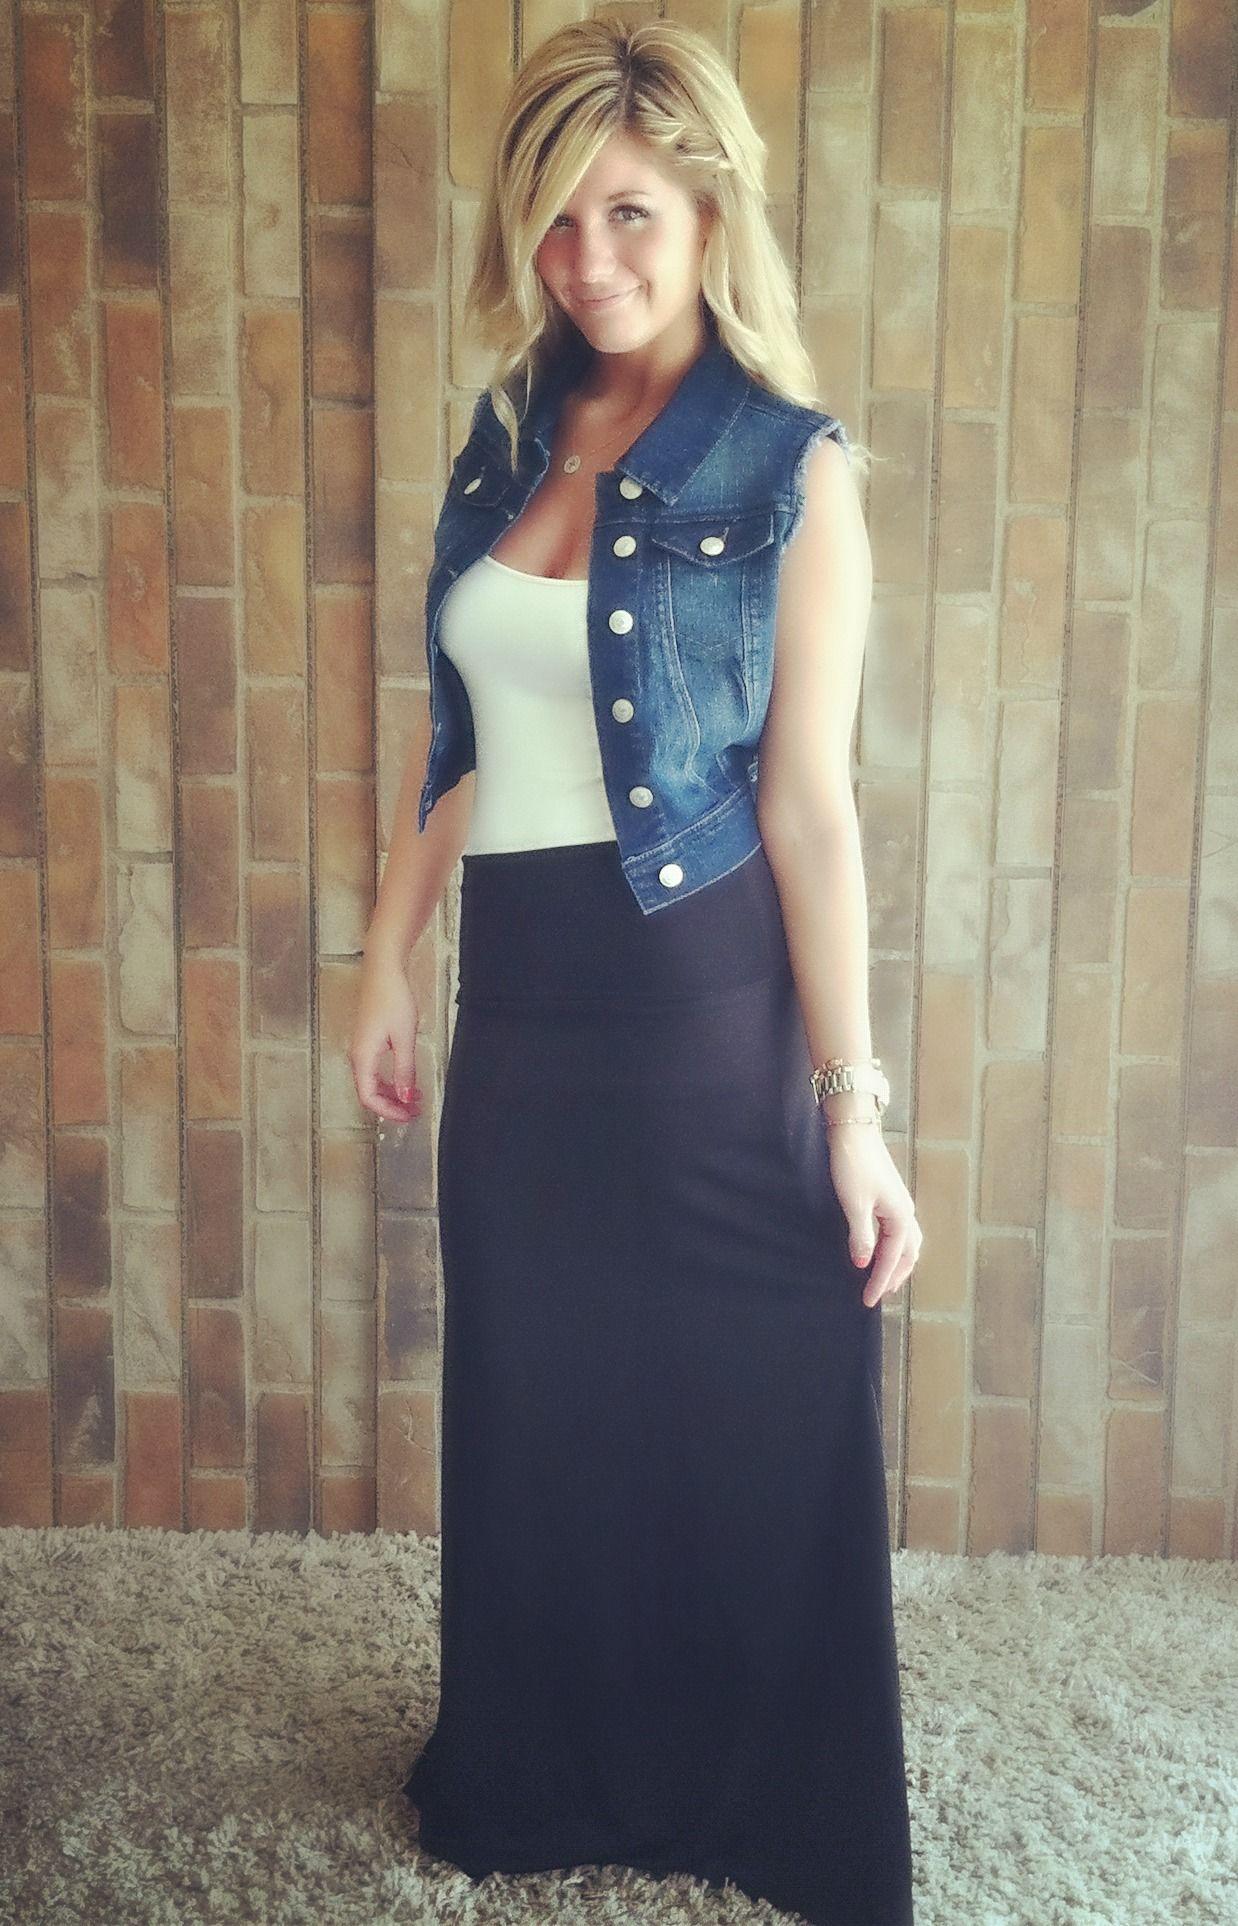 Denim vest, maxi skirt. all the rage this season! Fashion:dress ...